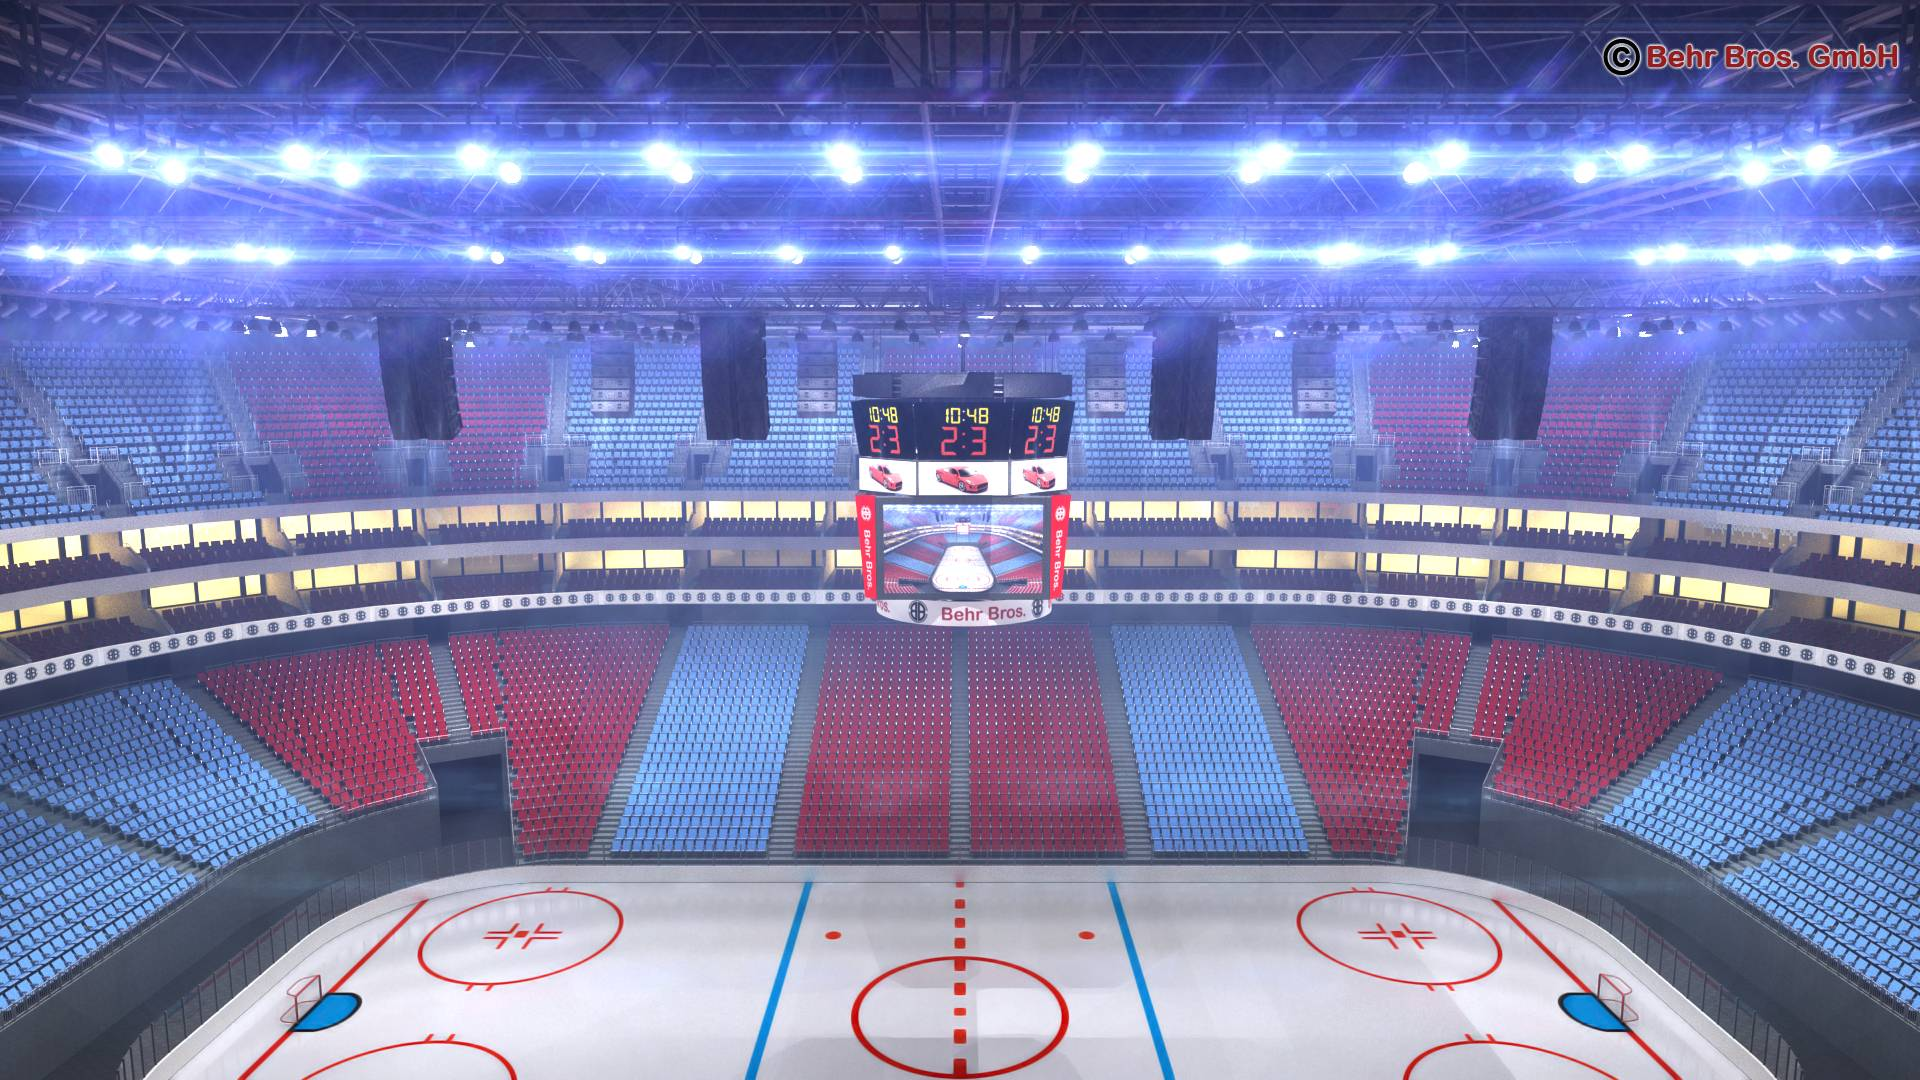 ice hockey arena v2 3d model 3ds max fbx c4d lwo ma mb obj 251656